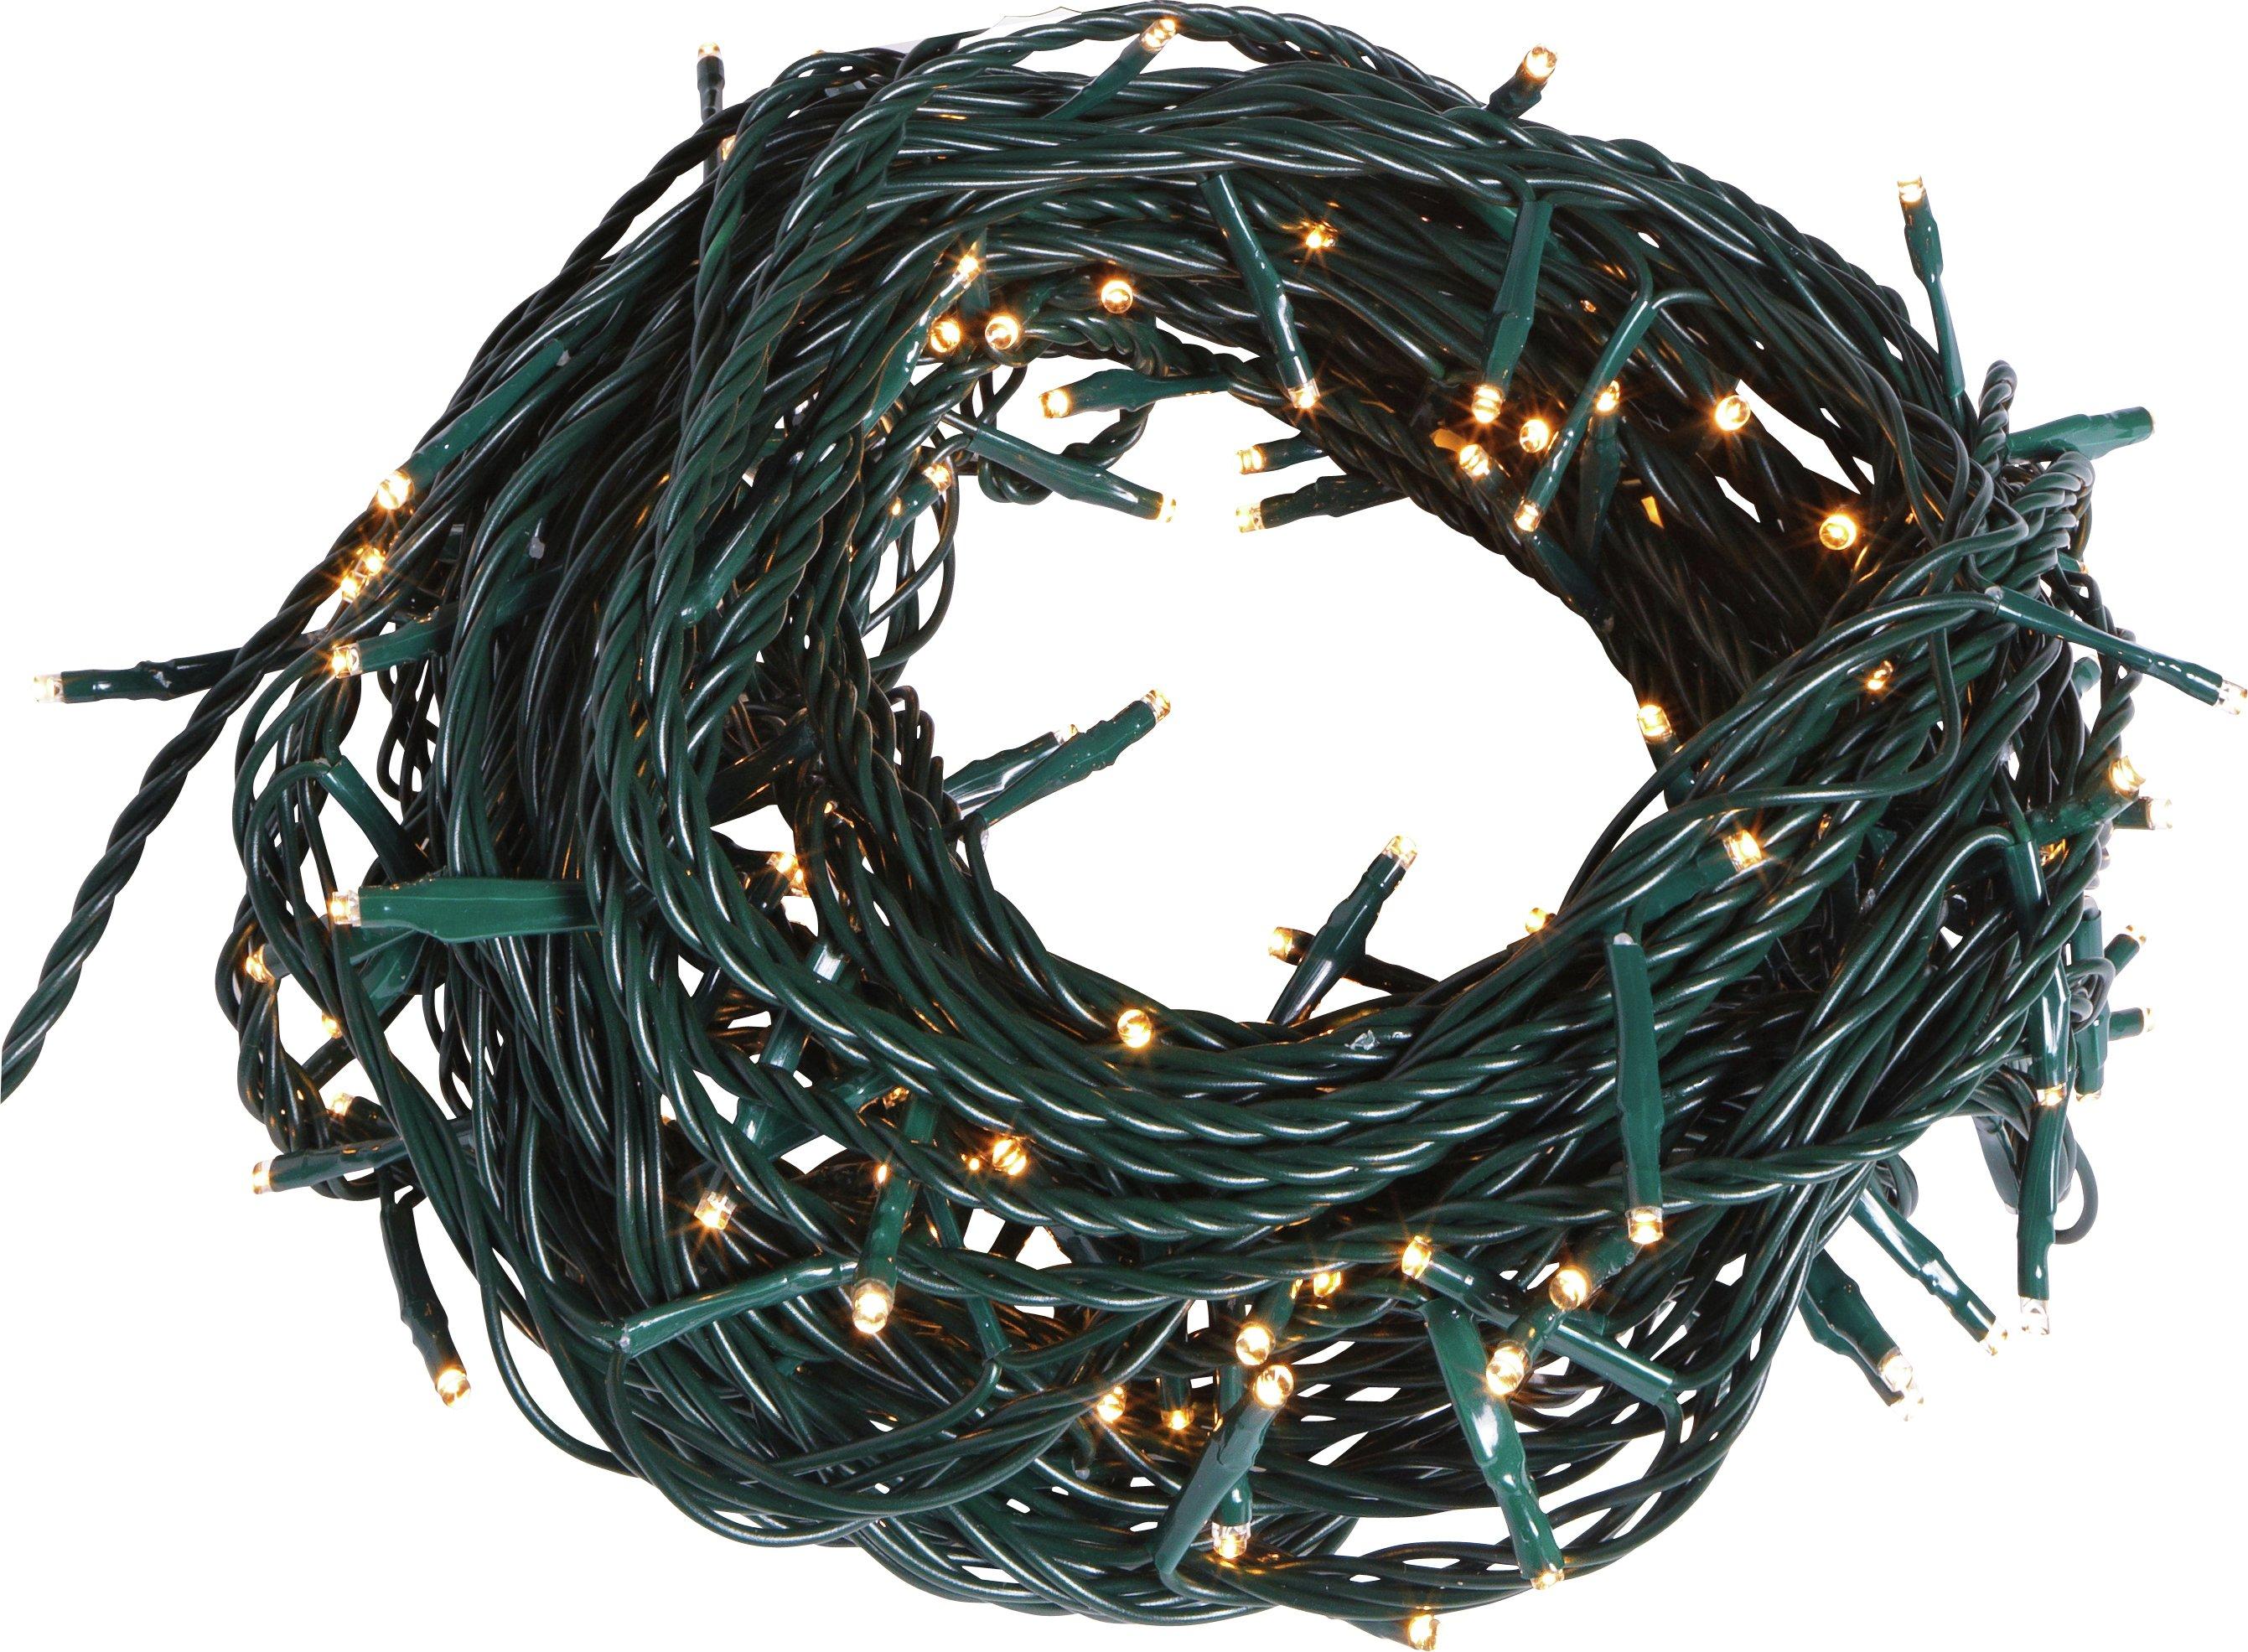 160 Multi-Function LED Christmas Tree Lights - Warm White